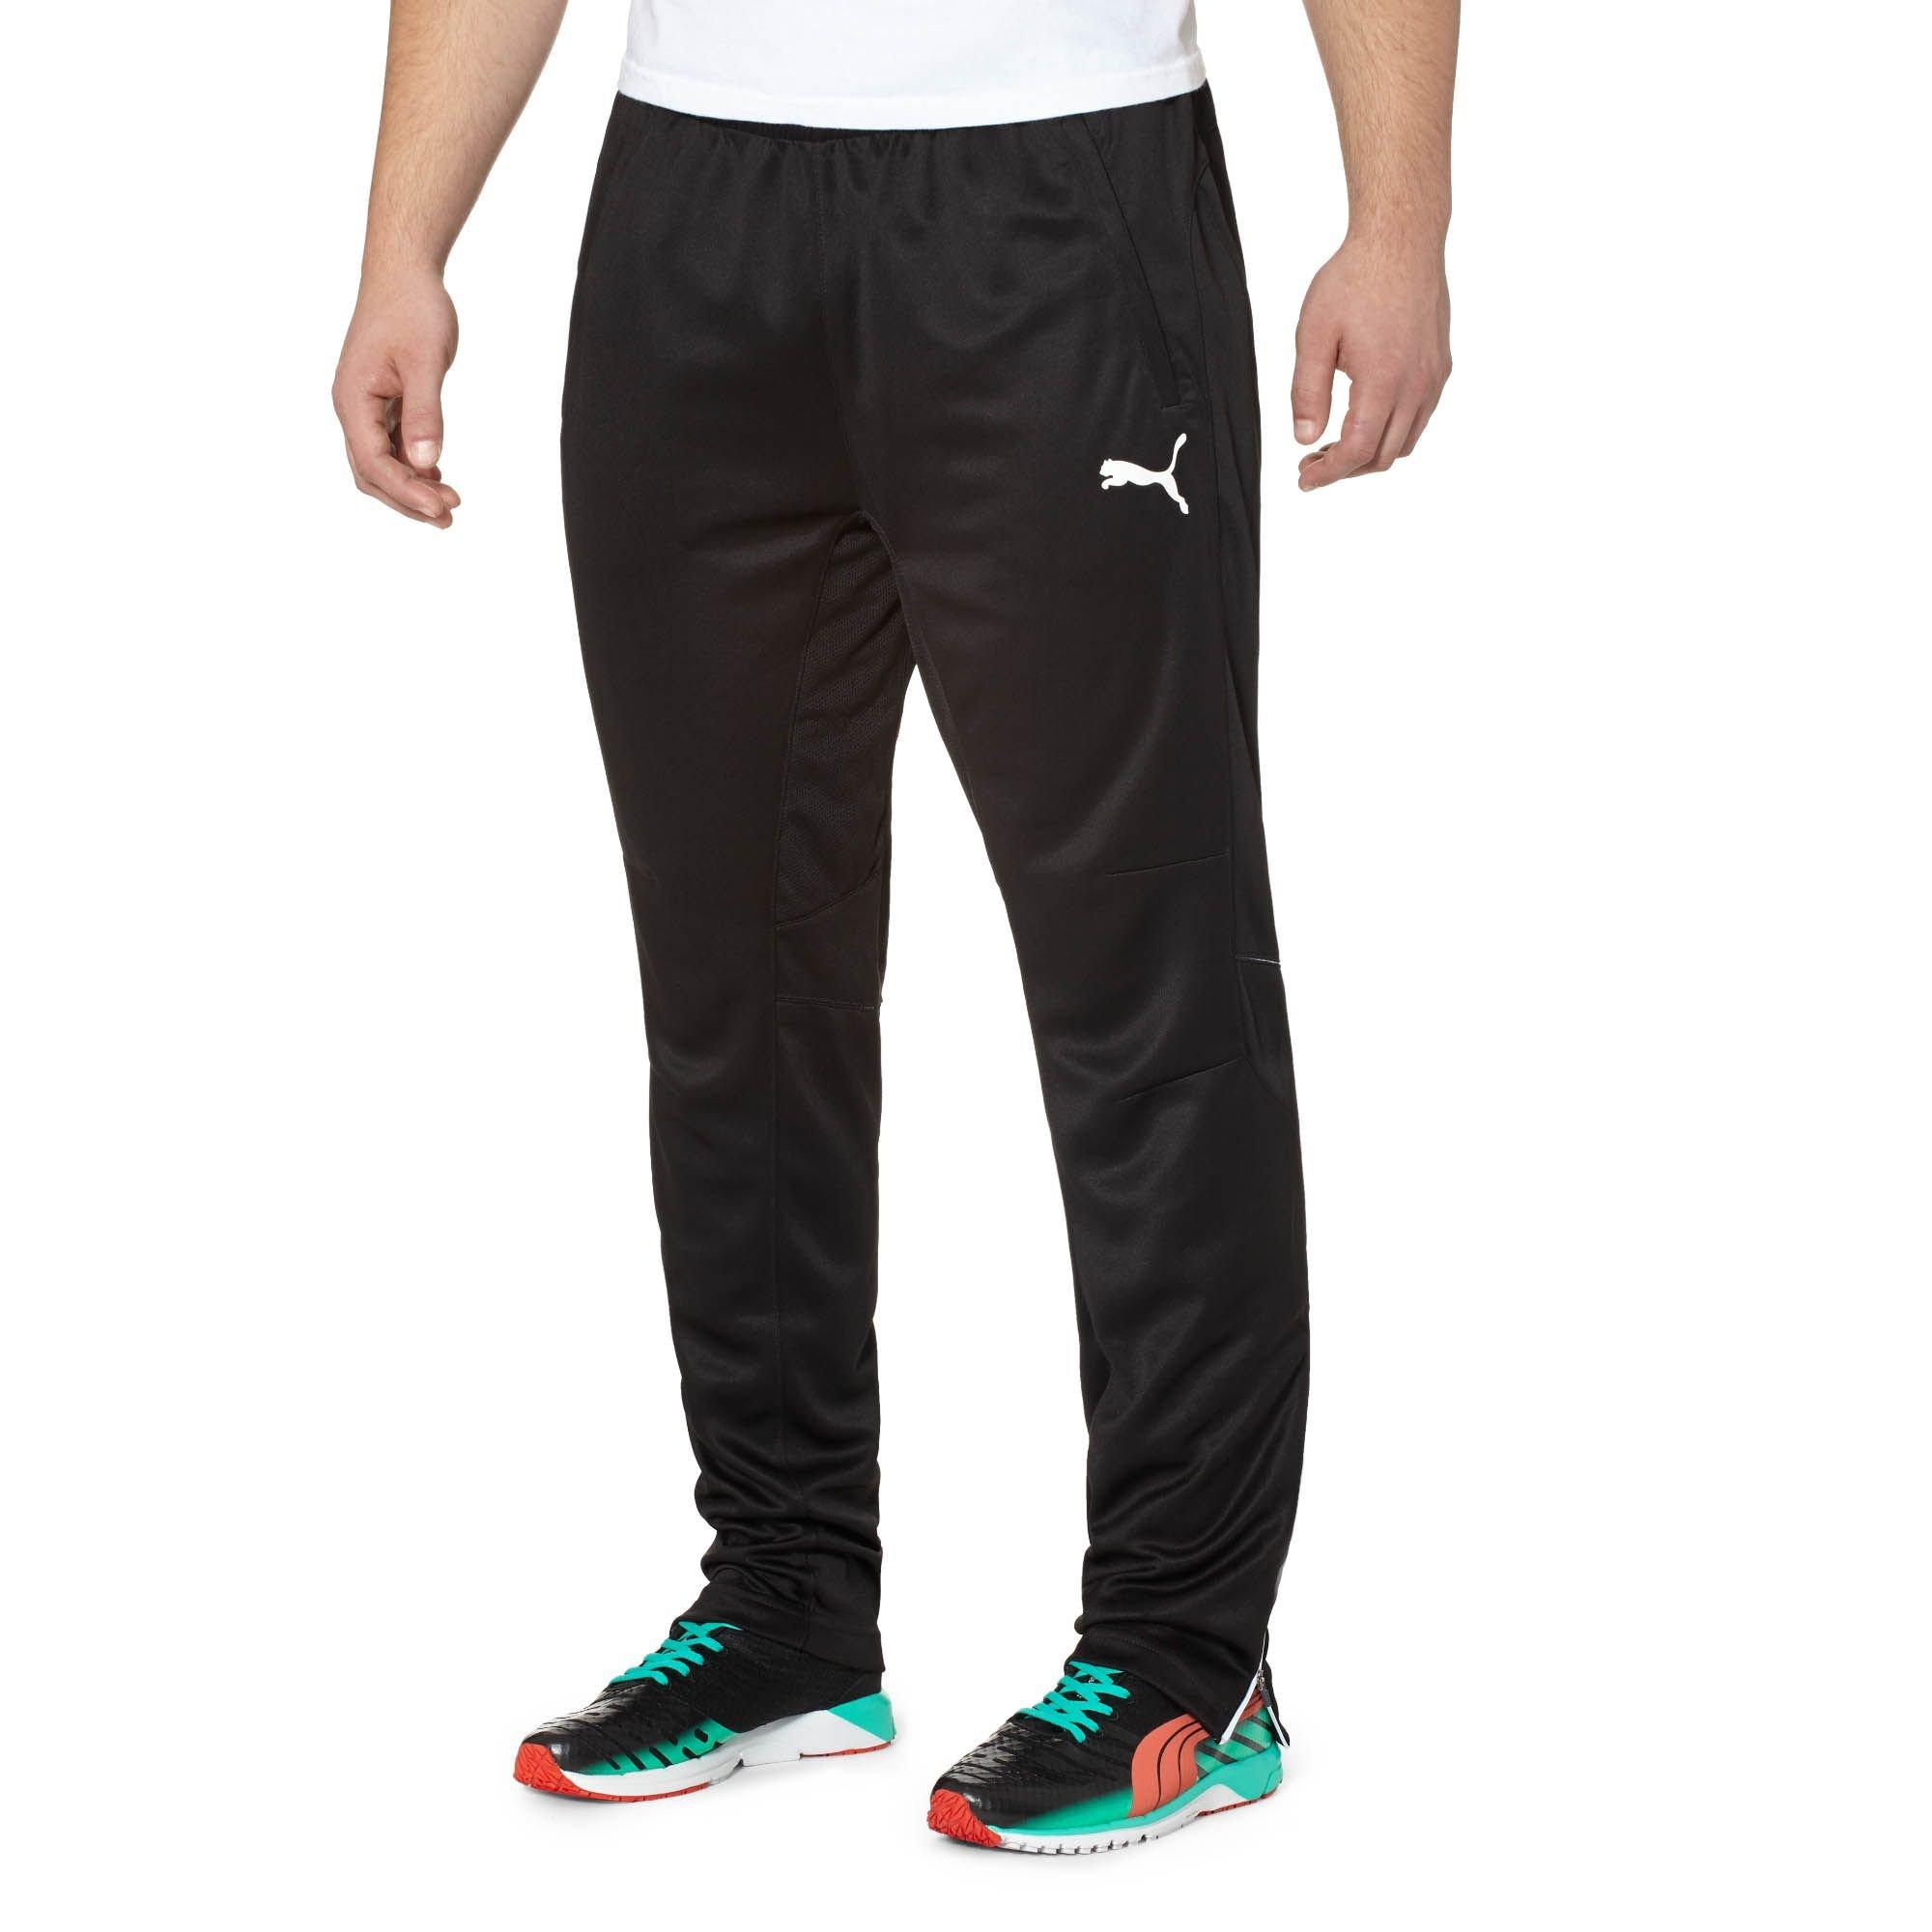 PUMA Men's Training Pant, Black/White YM